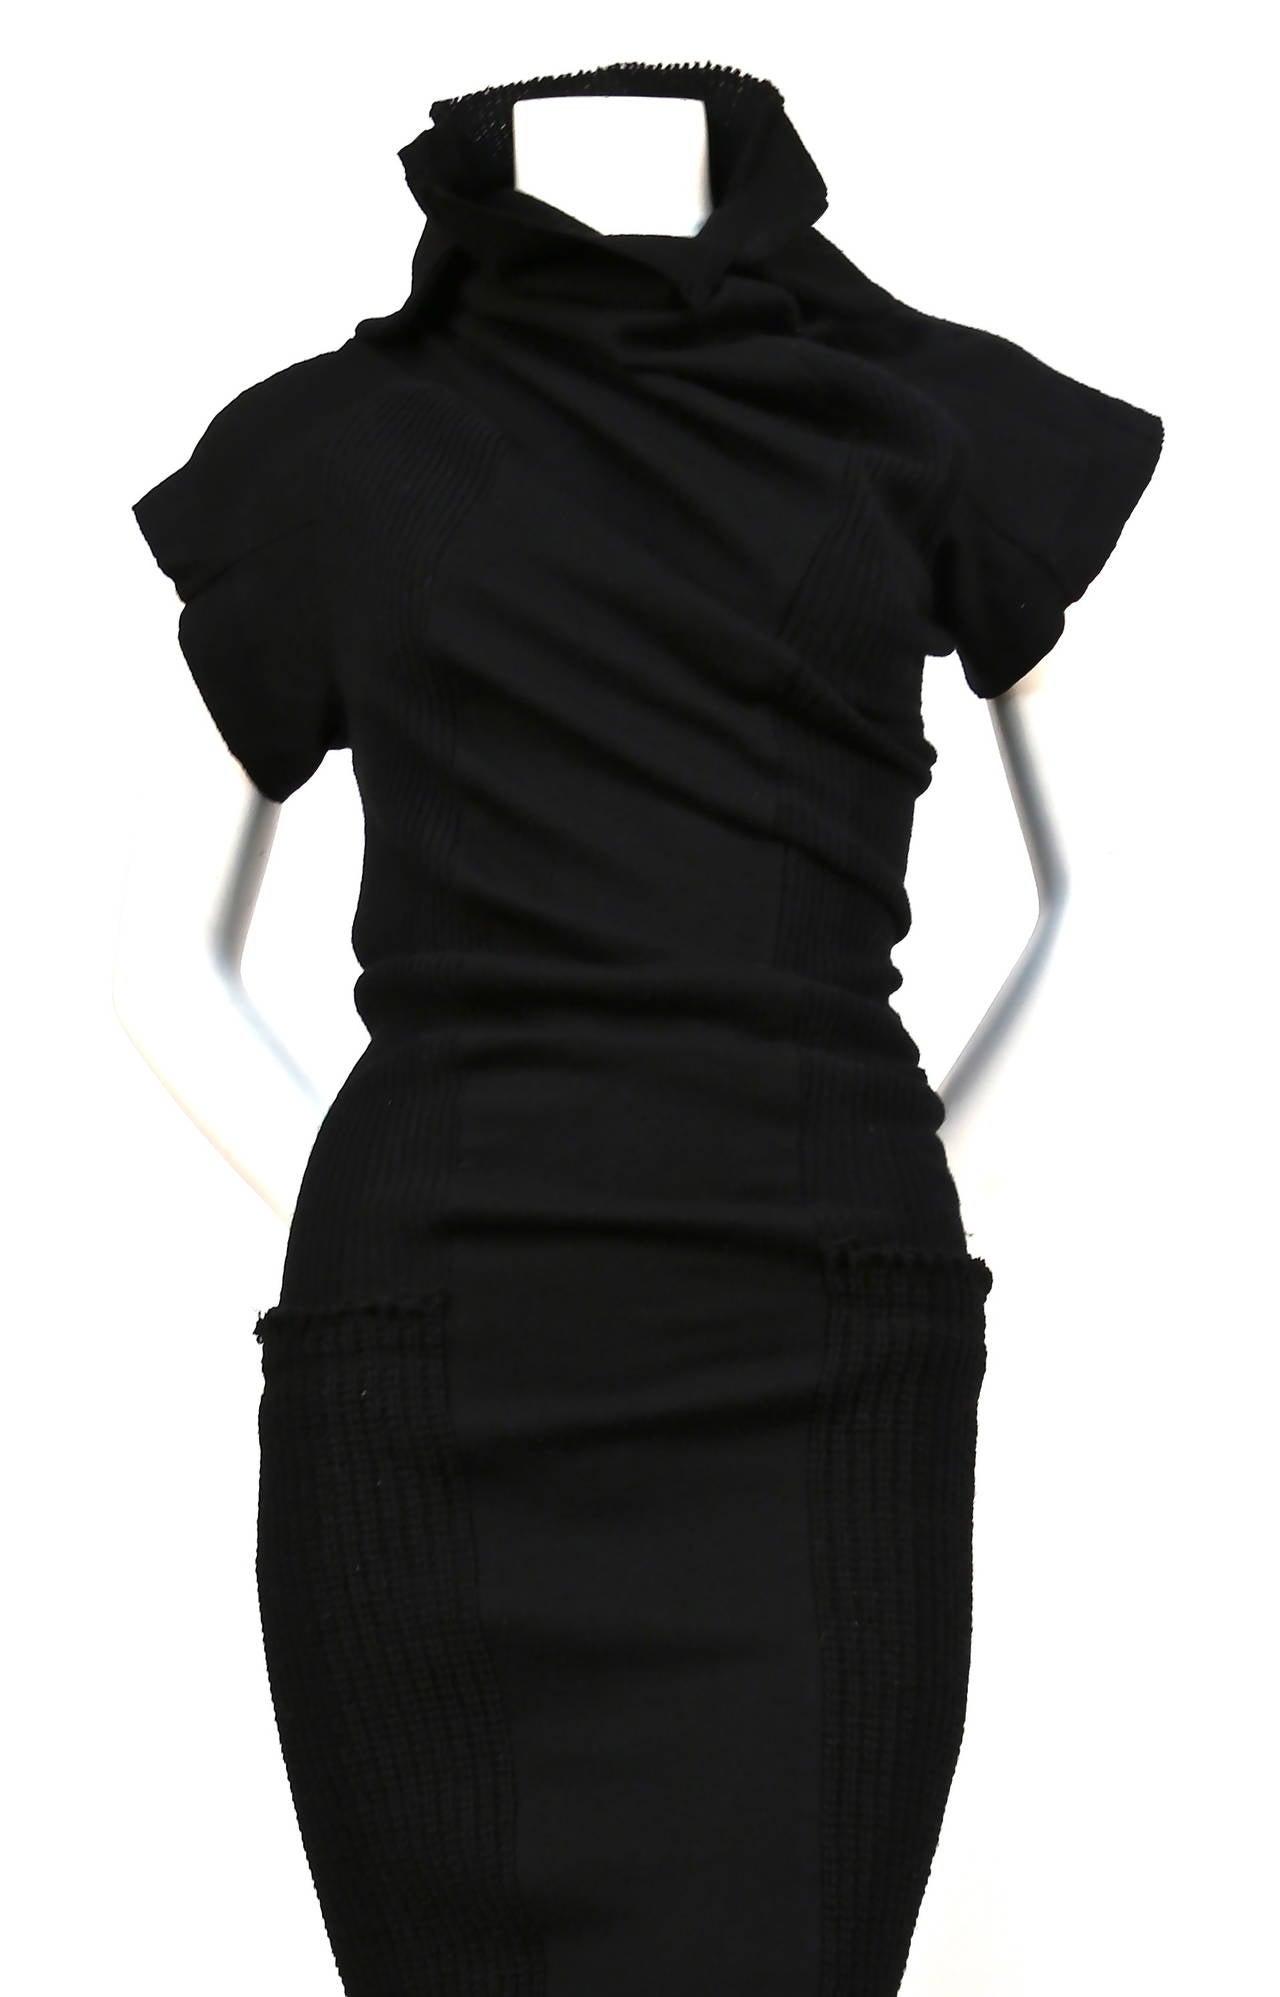 comme des garcons black twisted runway dress fall 2002 at 1stdibs. Black Bedroom Furniture Sets. Home Design Ideas